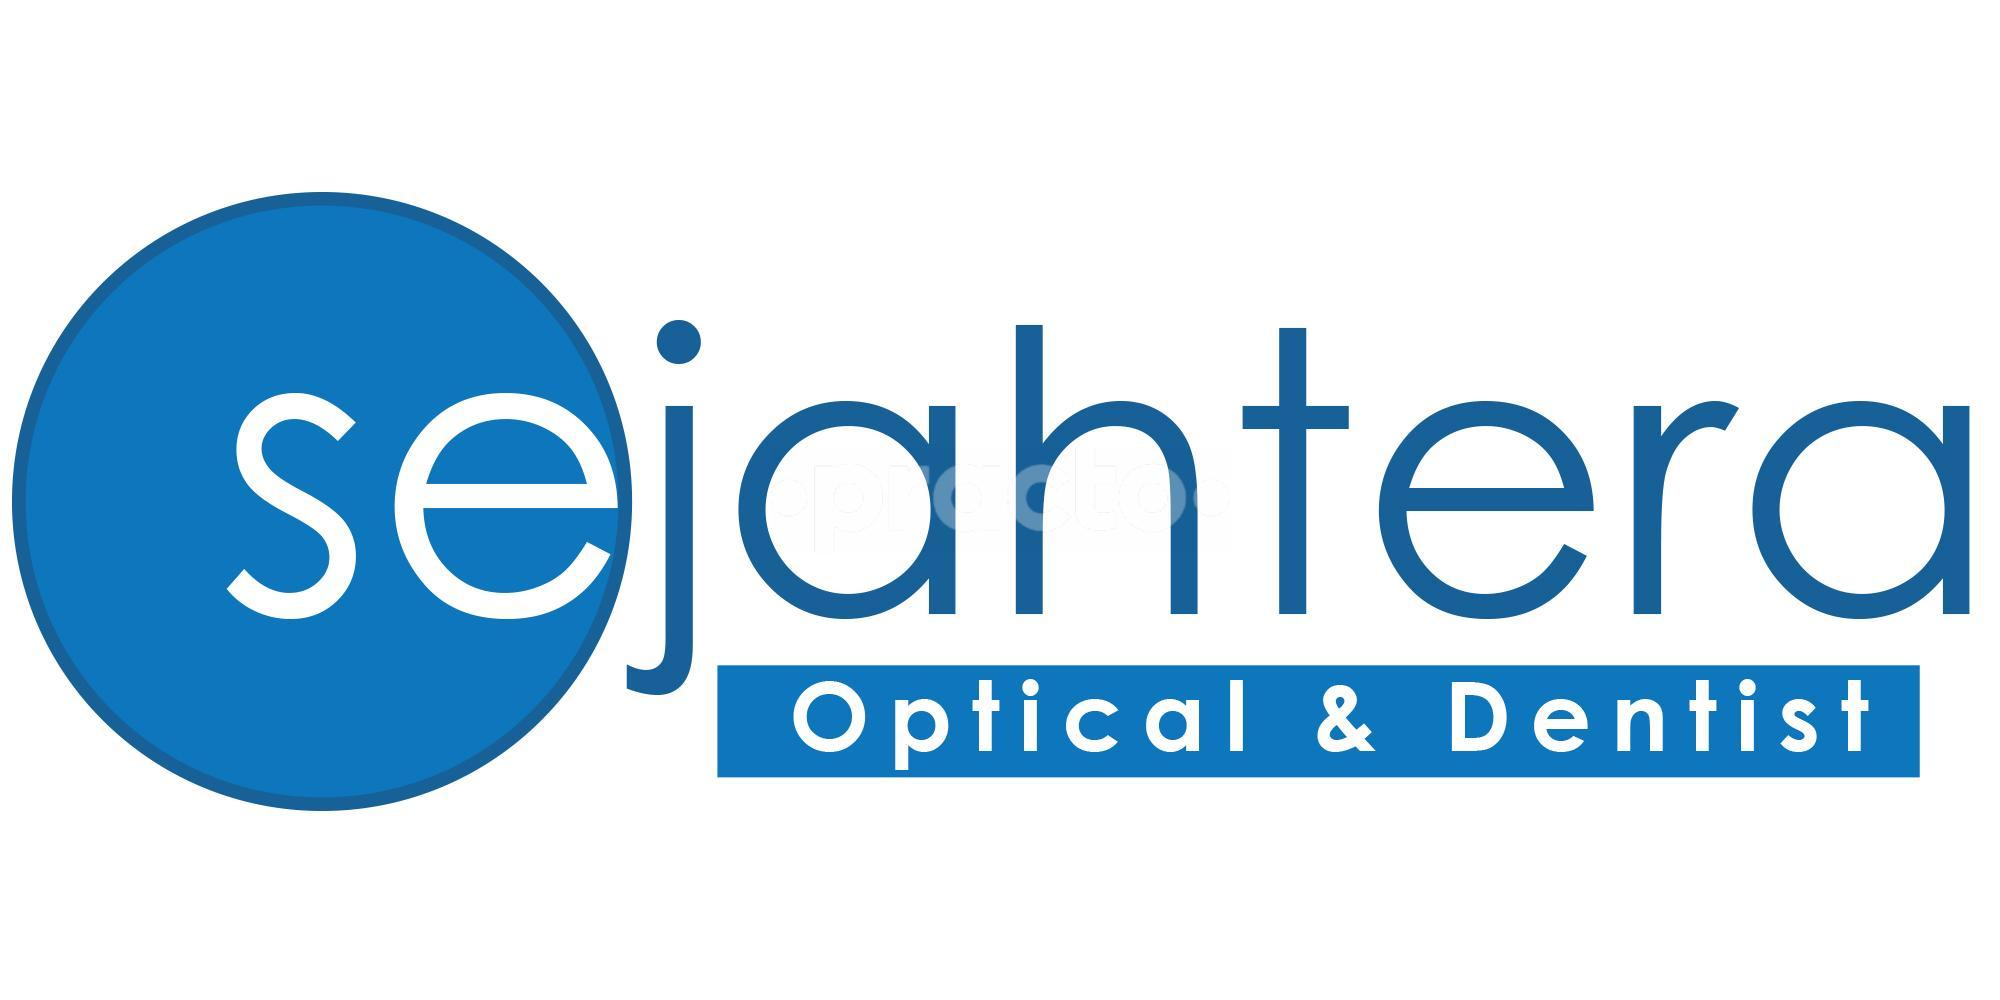 Sejahtera Optical & Dentist